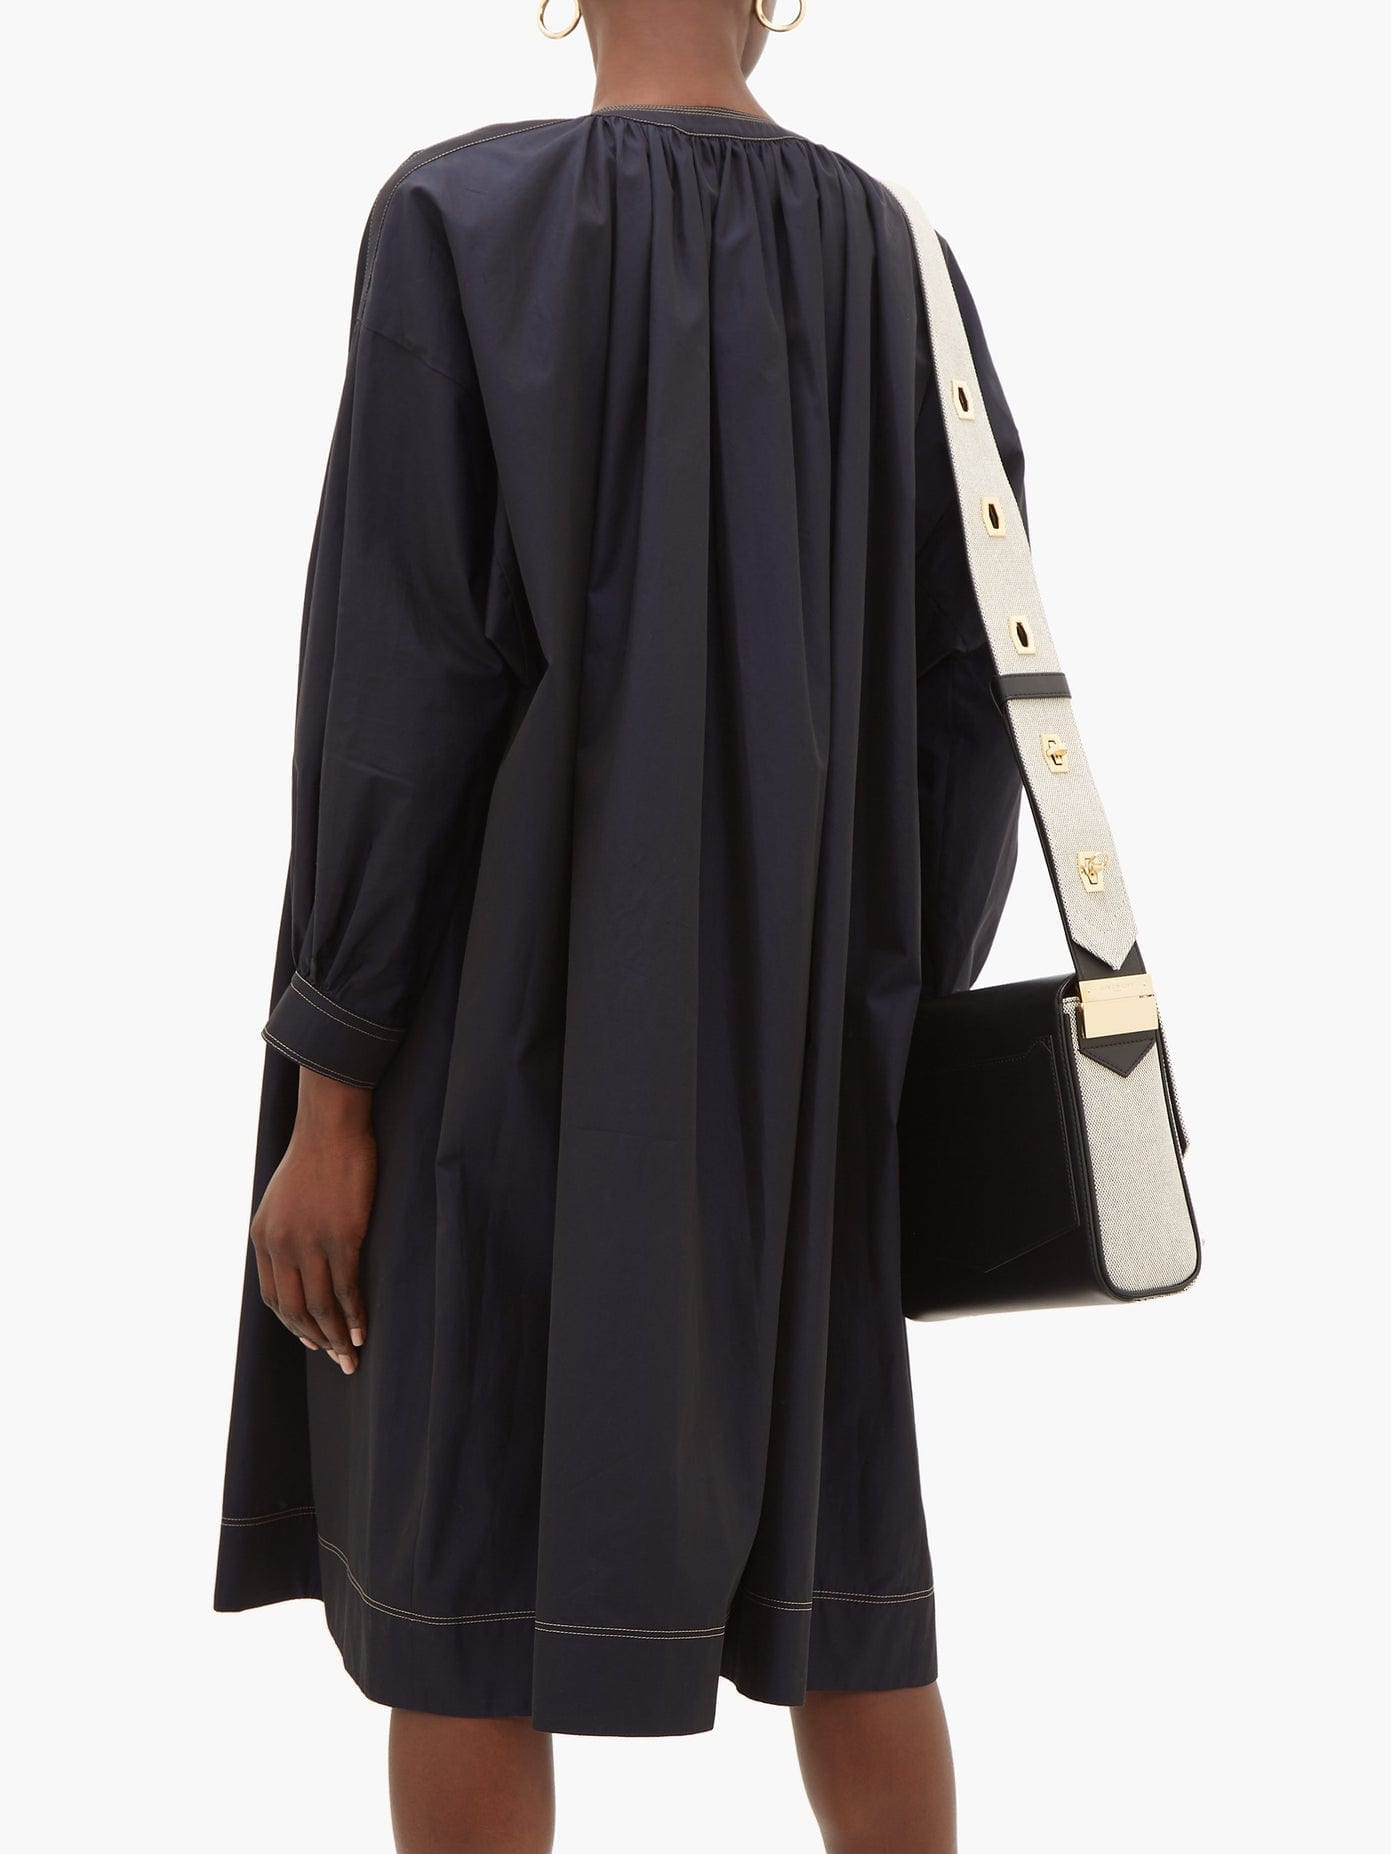 GIVENCHY Sailor Chain-neck Cotton-poplin Dress